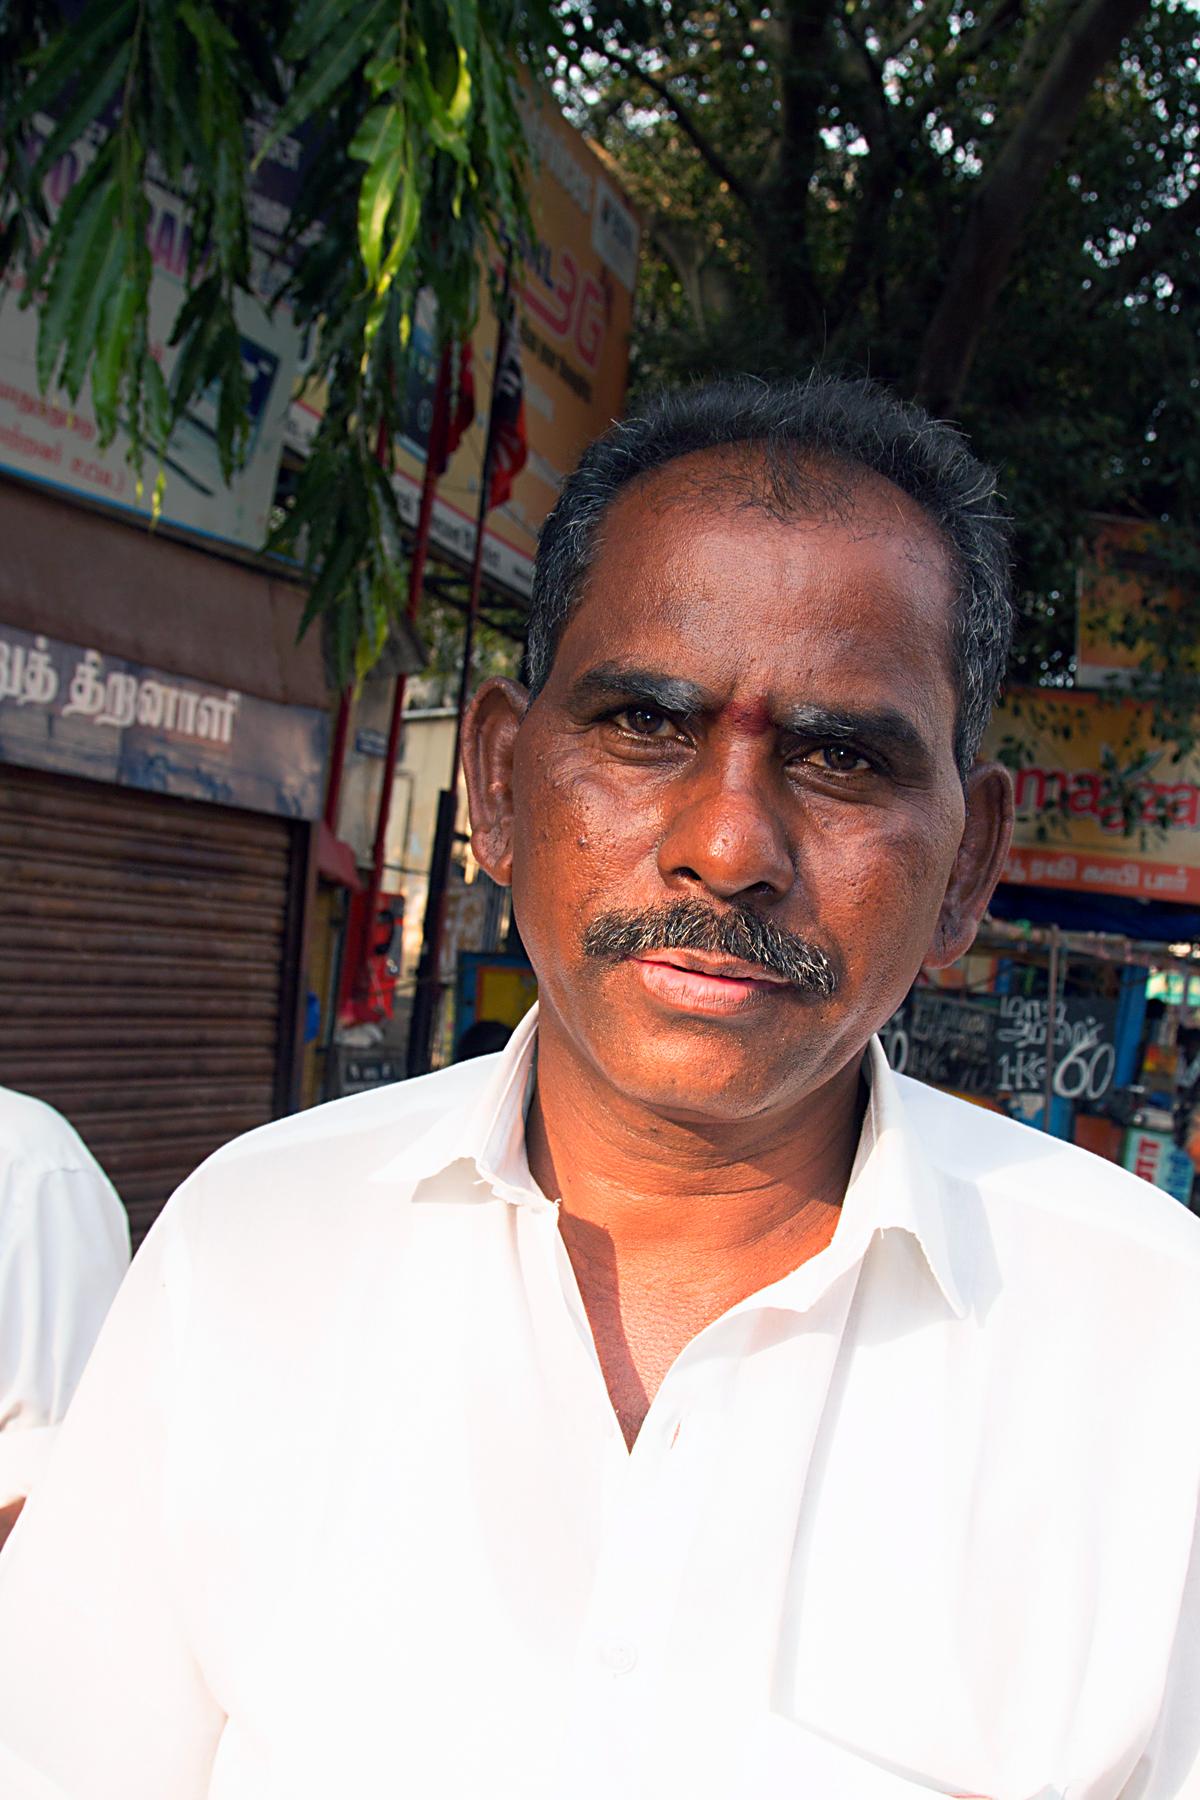 INDIEN Chennai Kanchipuram Tempel Menschen Tempel FINEST-onTour 7761.jpg